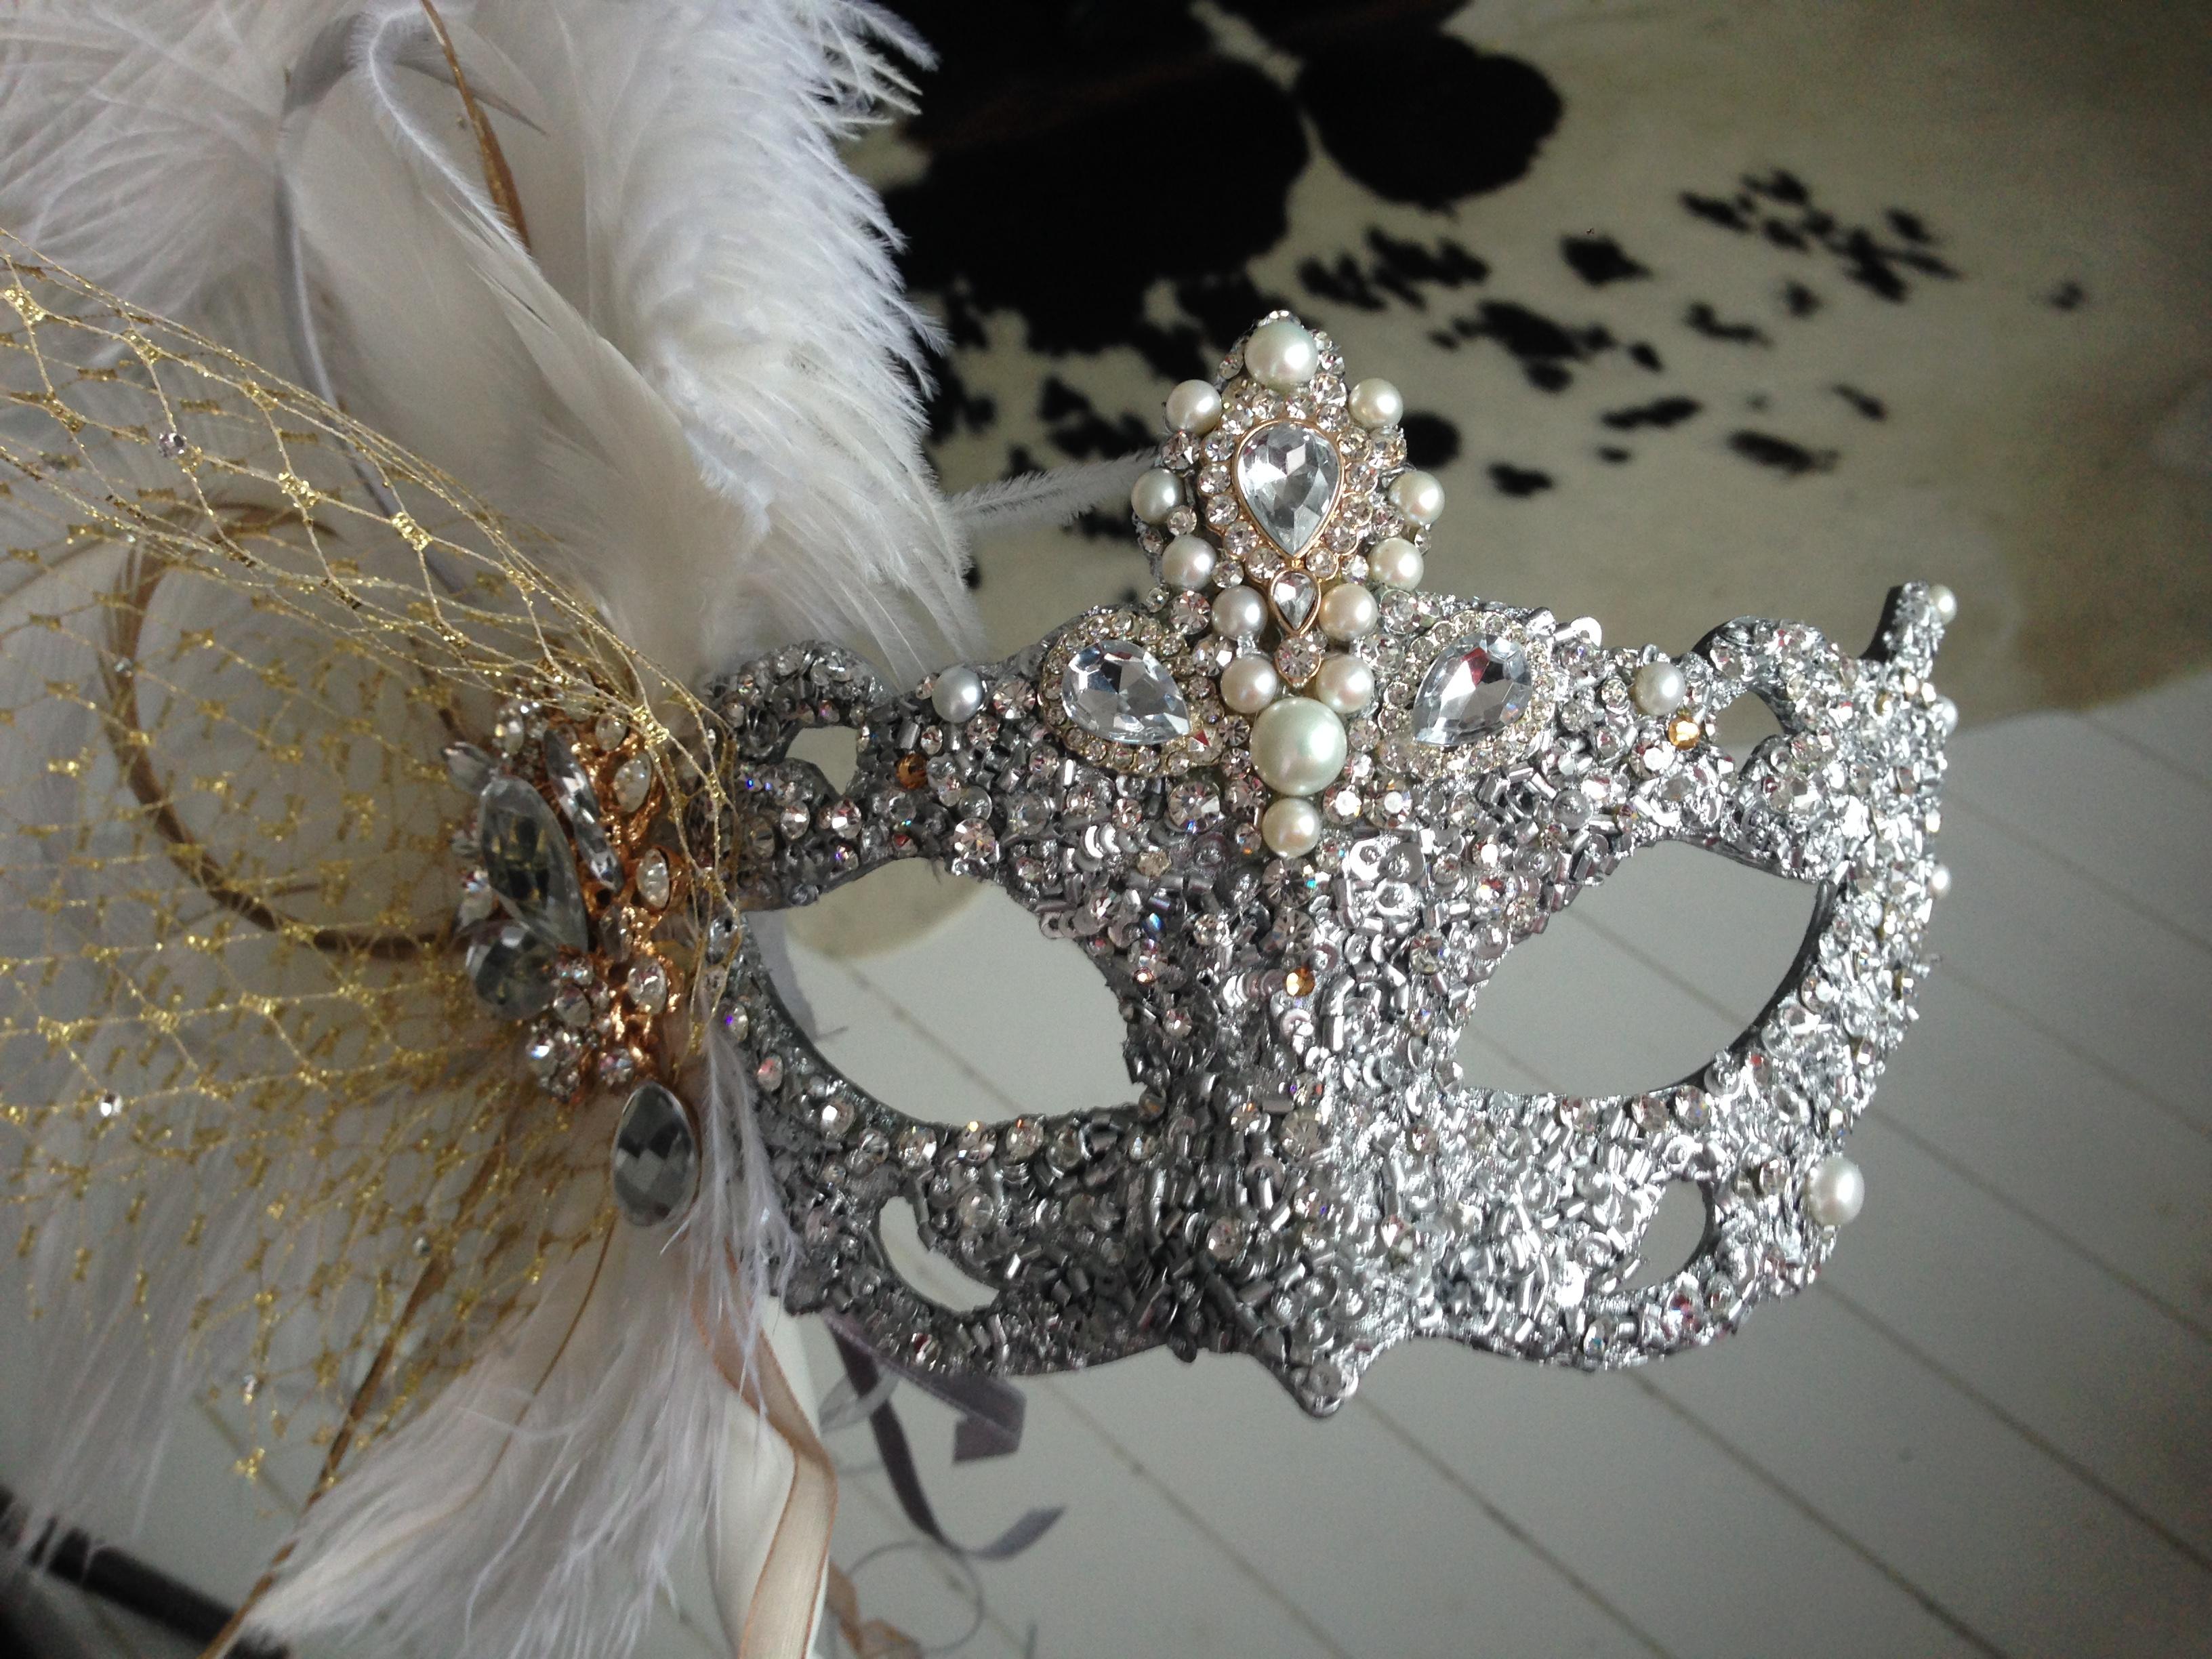 finished mask Cherie 003 - Masque Boutique Masquerade Masks